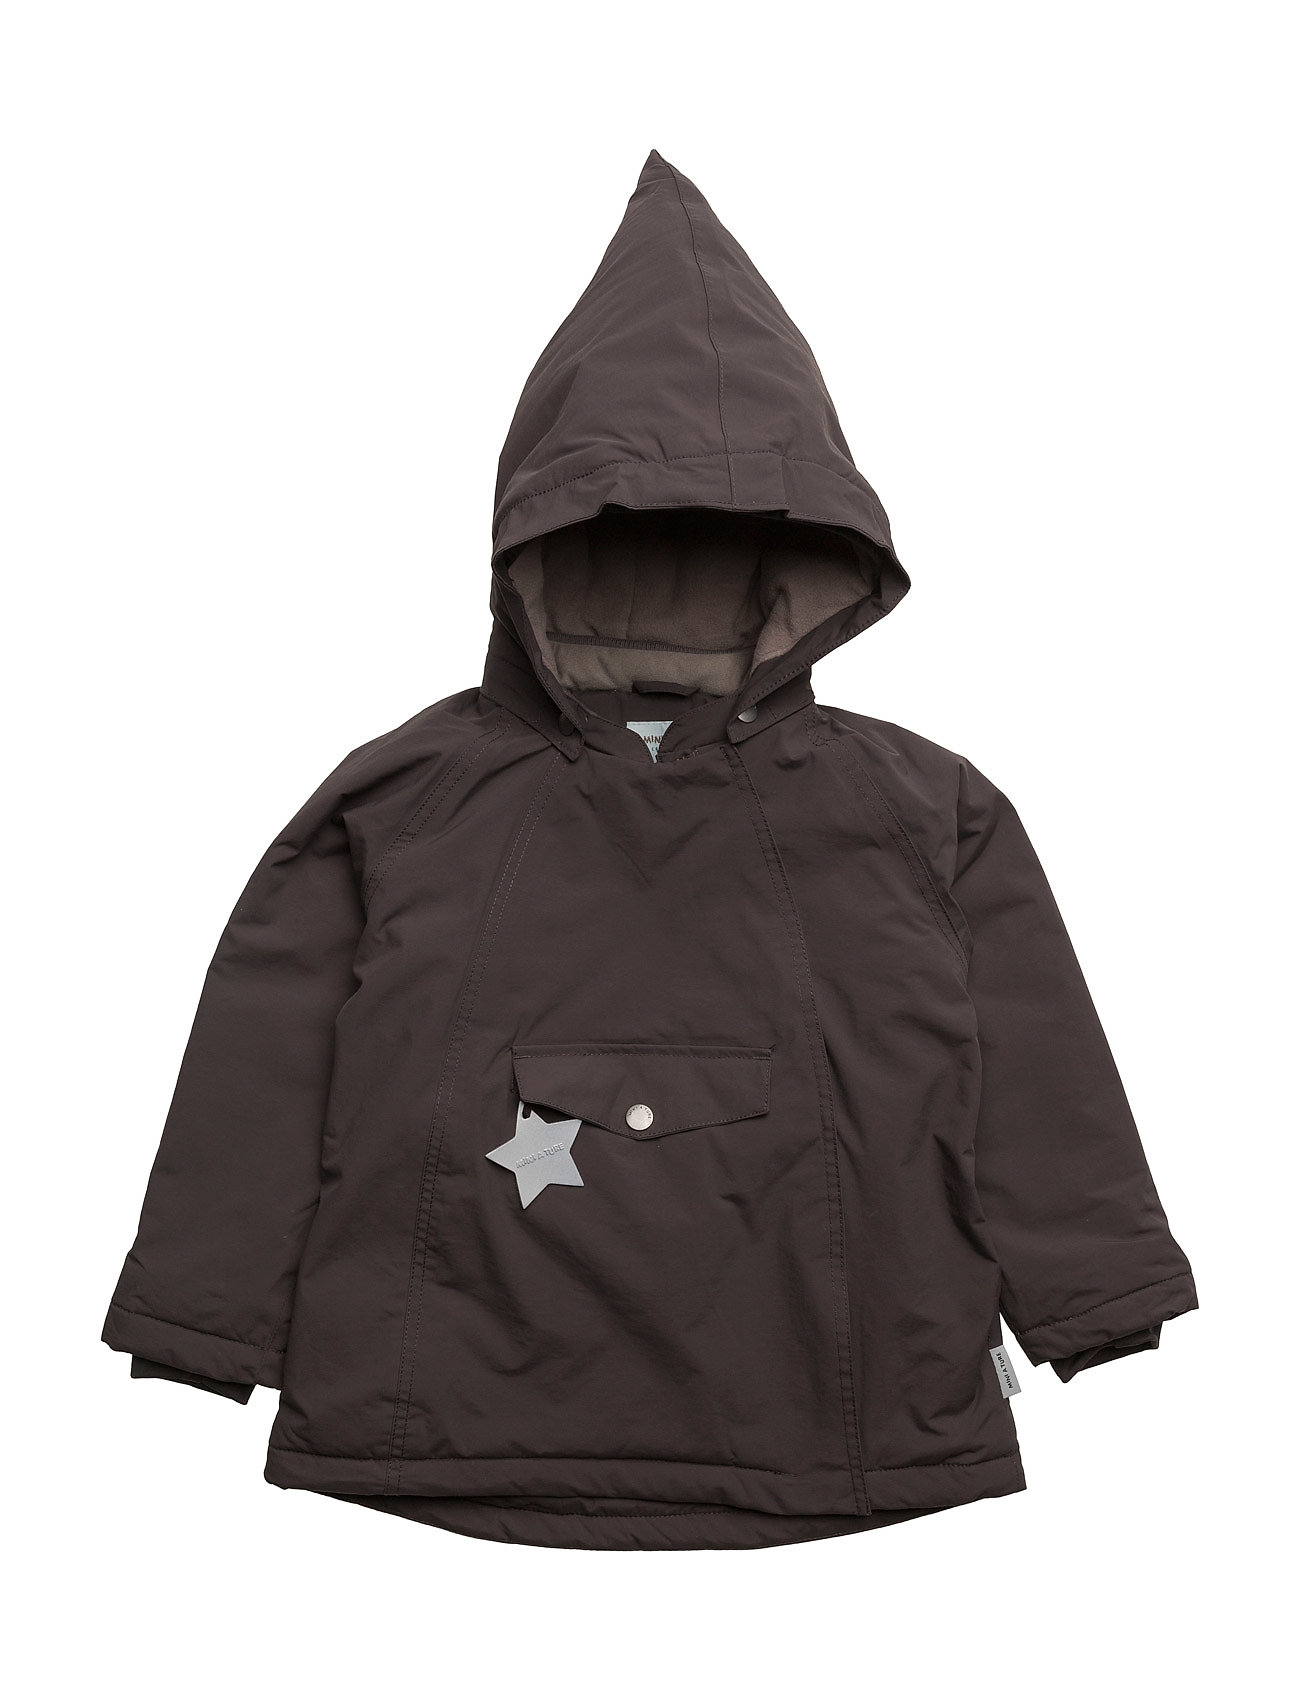 Wang, M Jacket Mini A Ture Jakker & Frakker til Børn i Mørk Kaffe